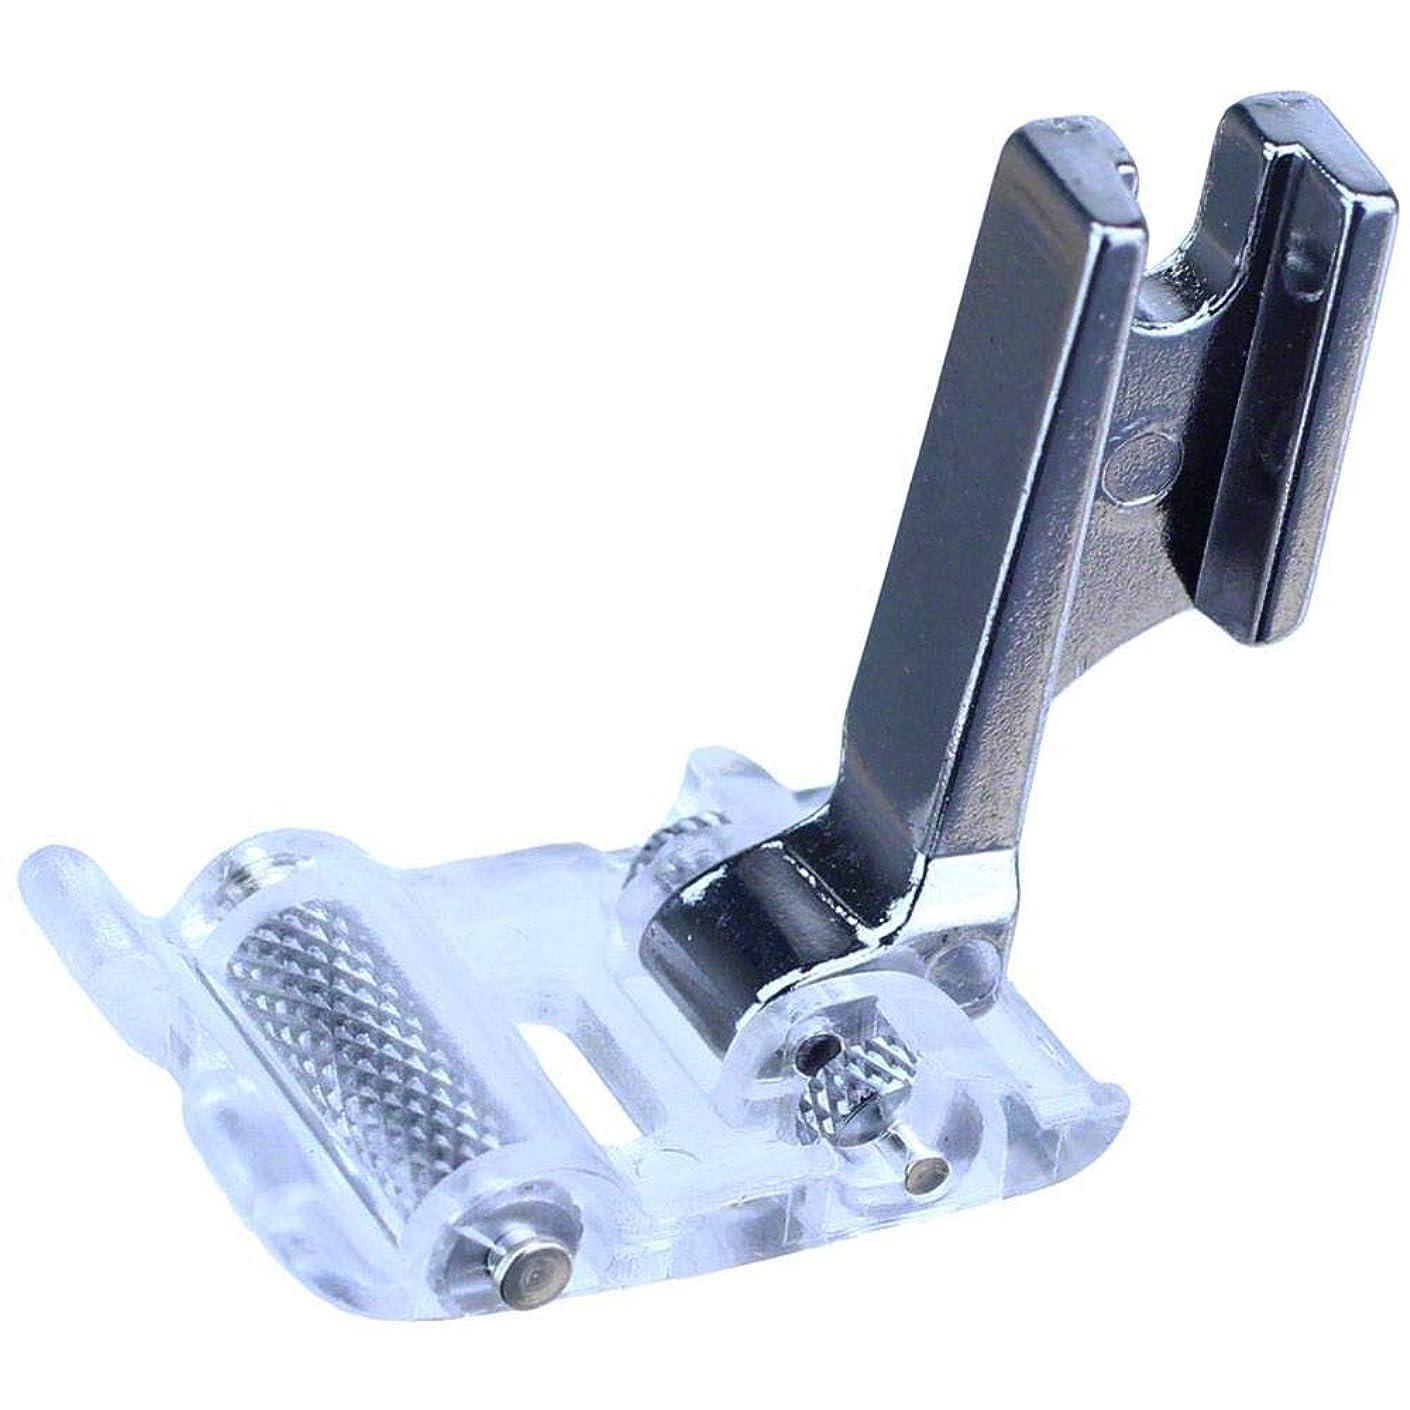 YICBOR High Shank Roller Foot #722H/ 152 for Pfaff 1209, 1211, 1212, 1213, 1214, 1216, 1217, 1221, 1222, 1222E